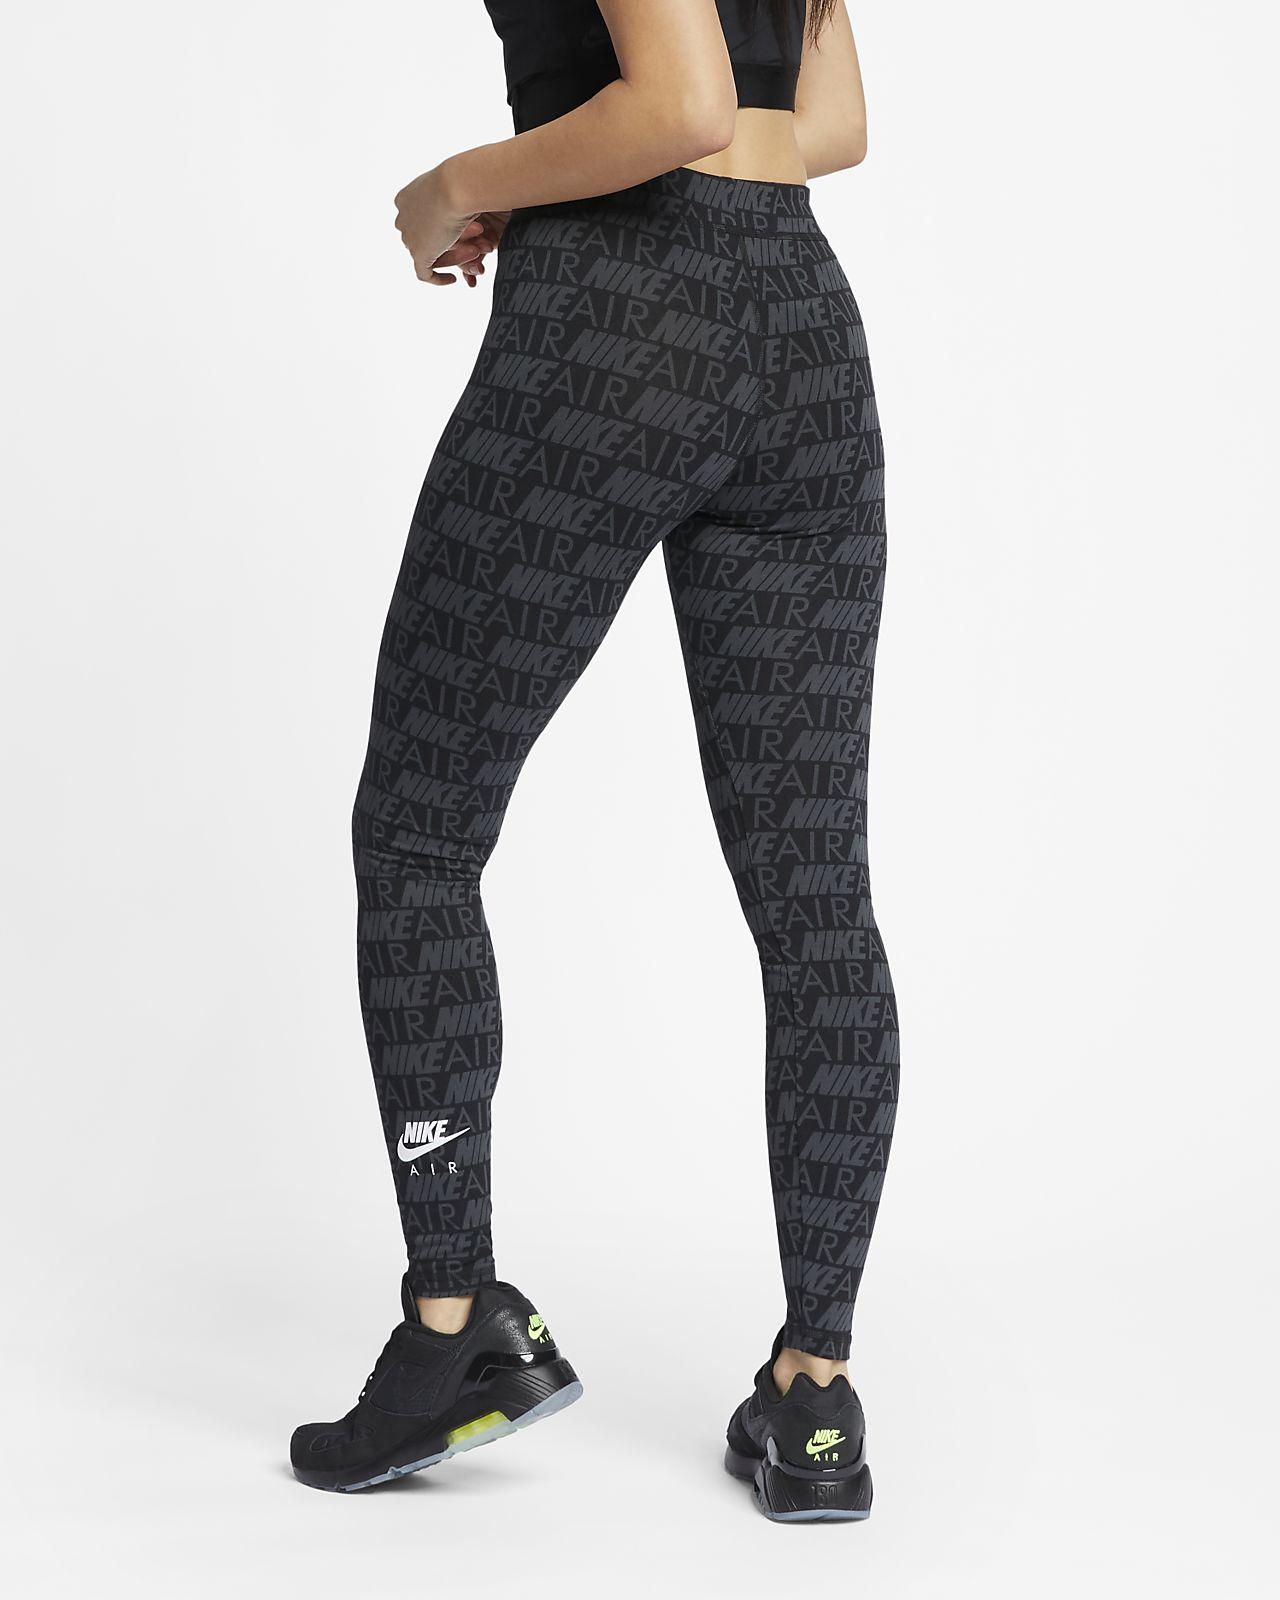 e95aa18625d1 Γυναικείο εμπριμέ κολάν Nike Air. Nike.com GR